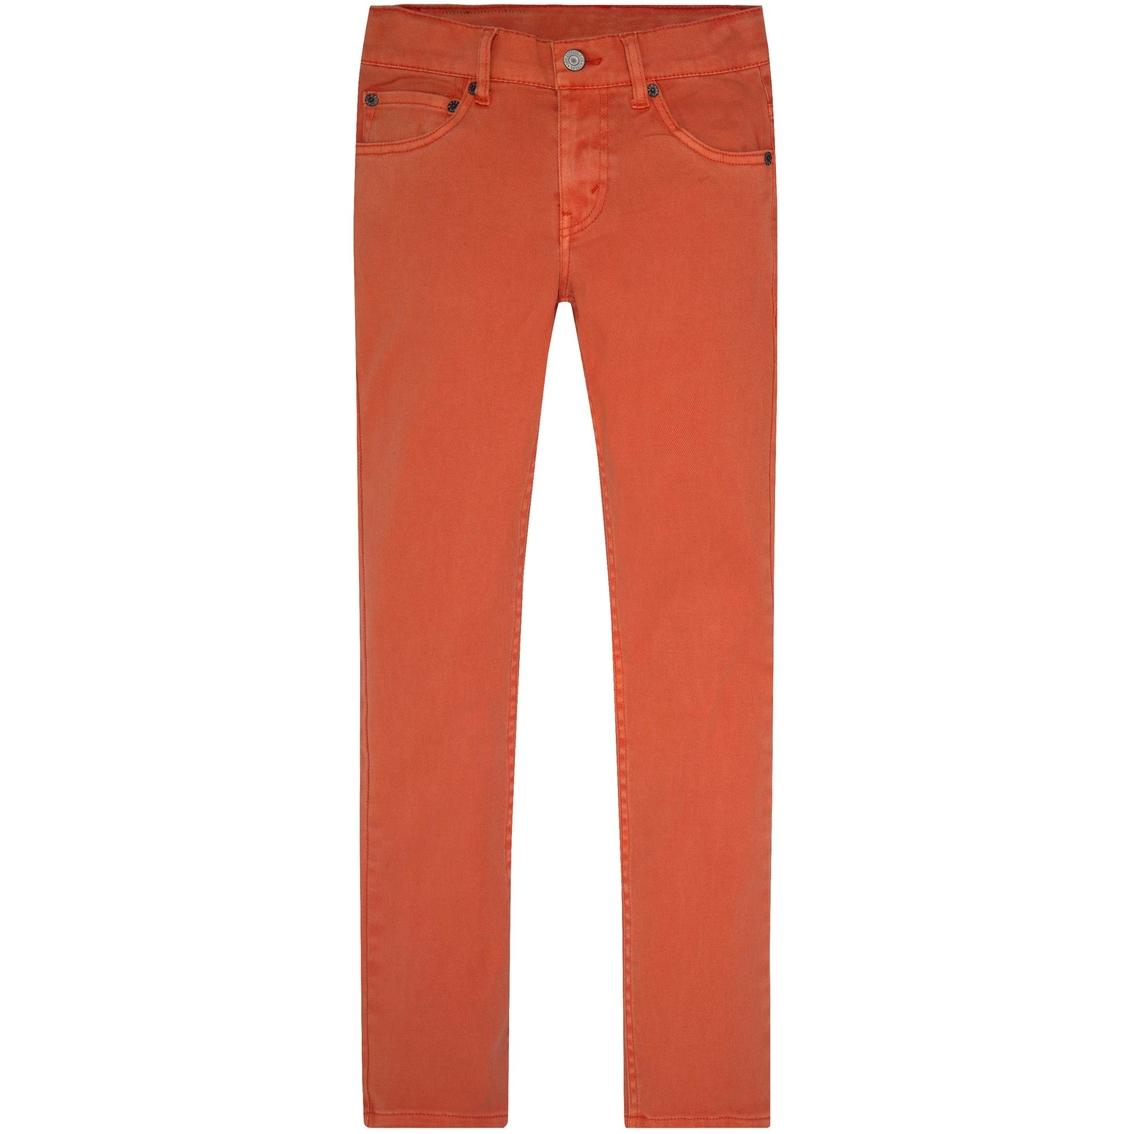 6967cb899 Levi's Boys 511 Slim Fit Stretch Pants | Boys 8-20 | Apparel | Shop ...